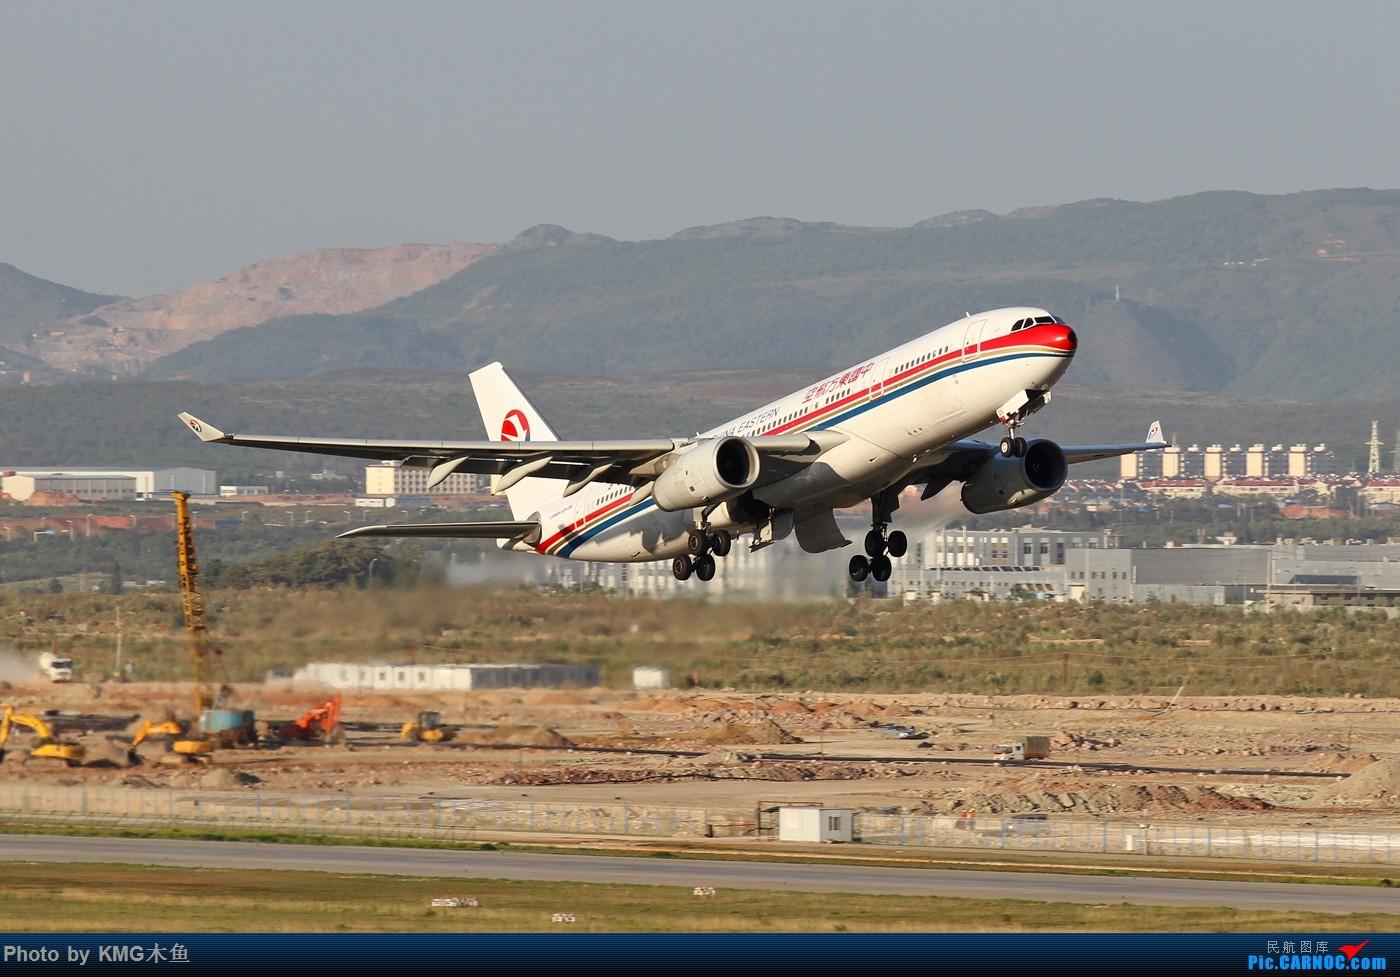 Re:[原创]【KMG】【昆明长水国际机场的东航330】东航云南高颜值的330,1600大图欣赏 AIRBUS A330-200 B-5926 中国昆明长水国际机场